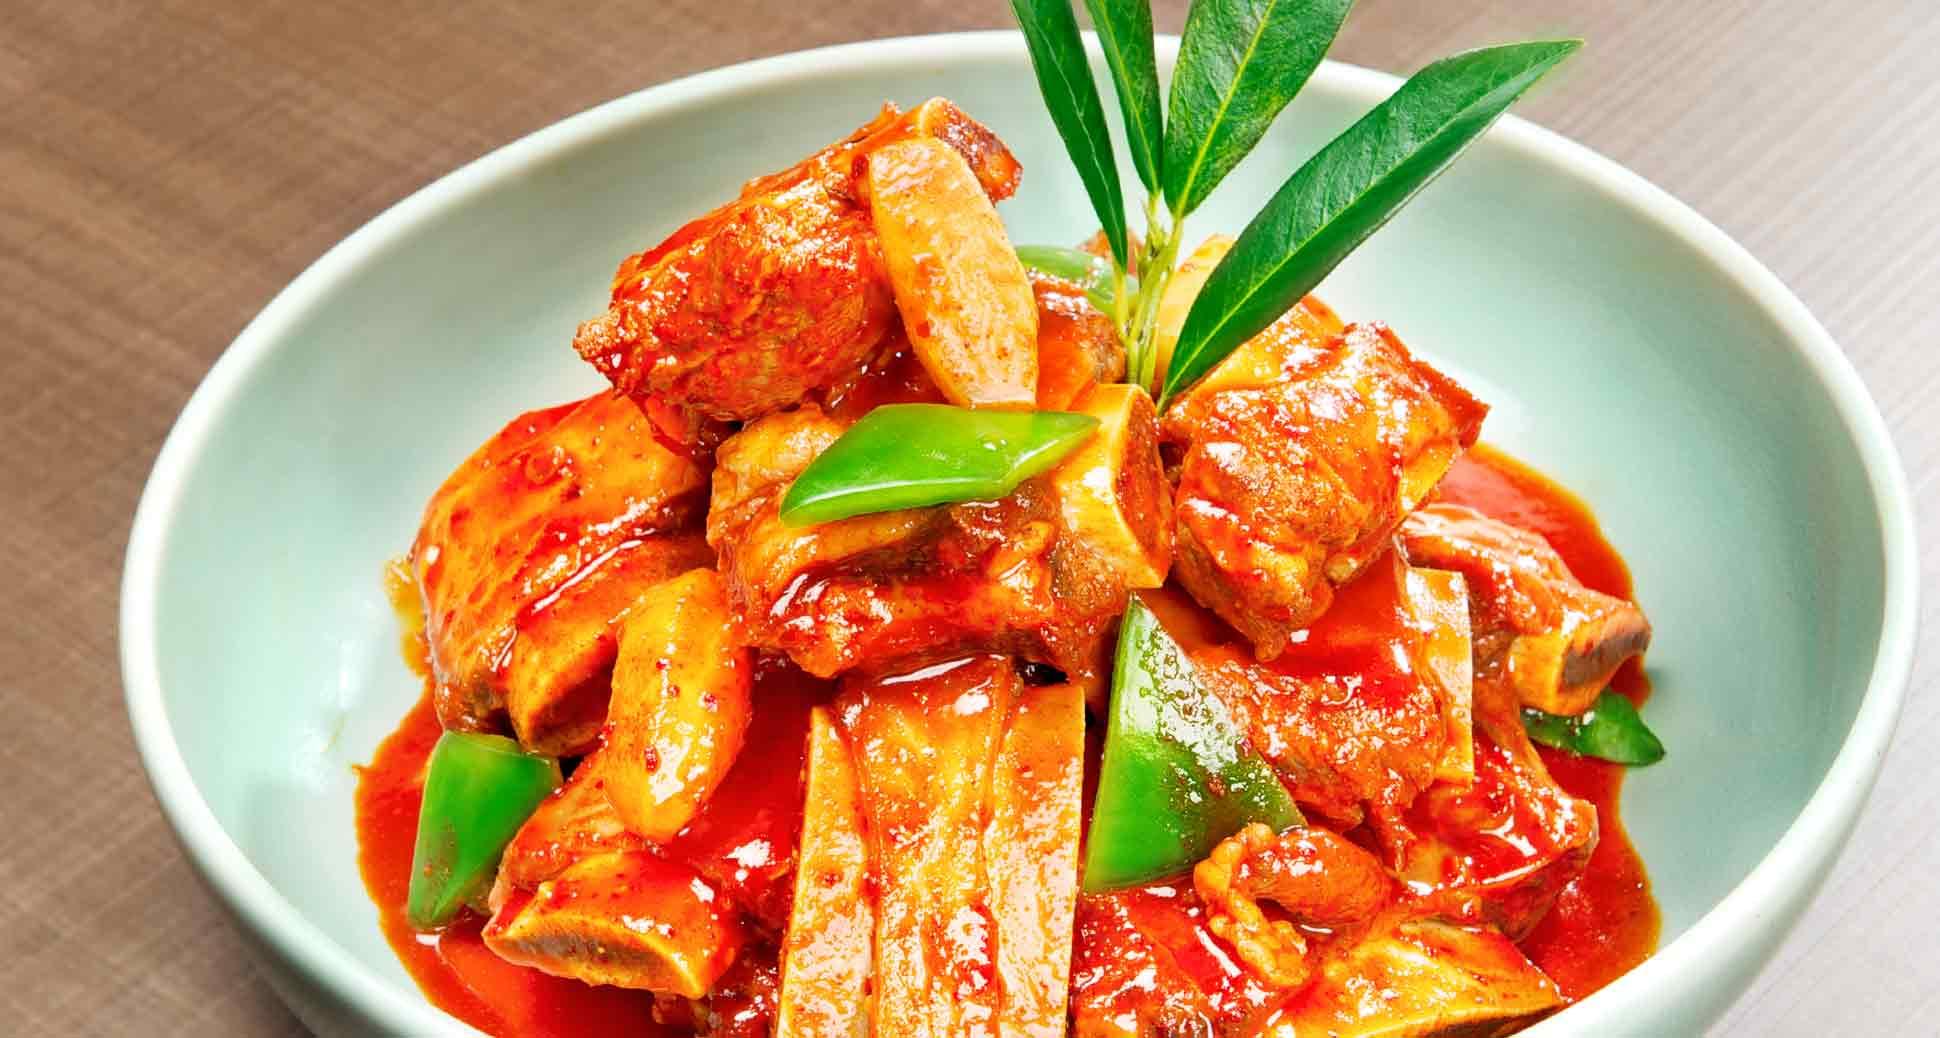 Sura Korean Royal Cuisine Restaurant News Sweating Out